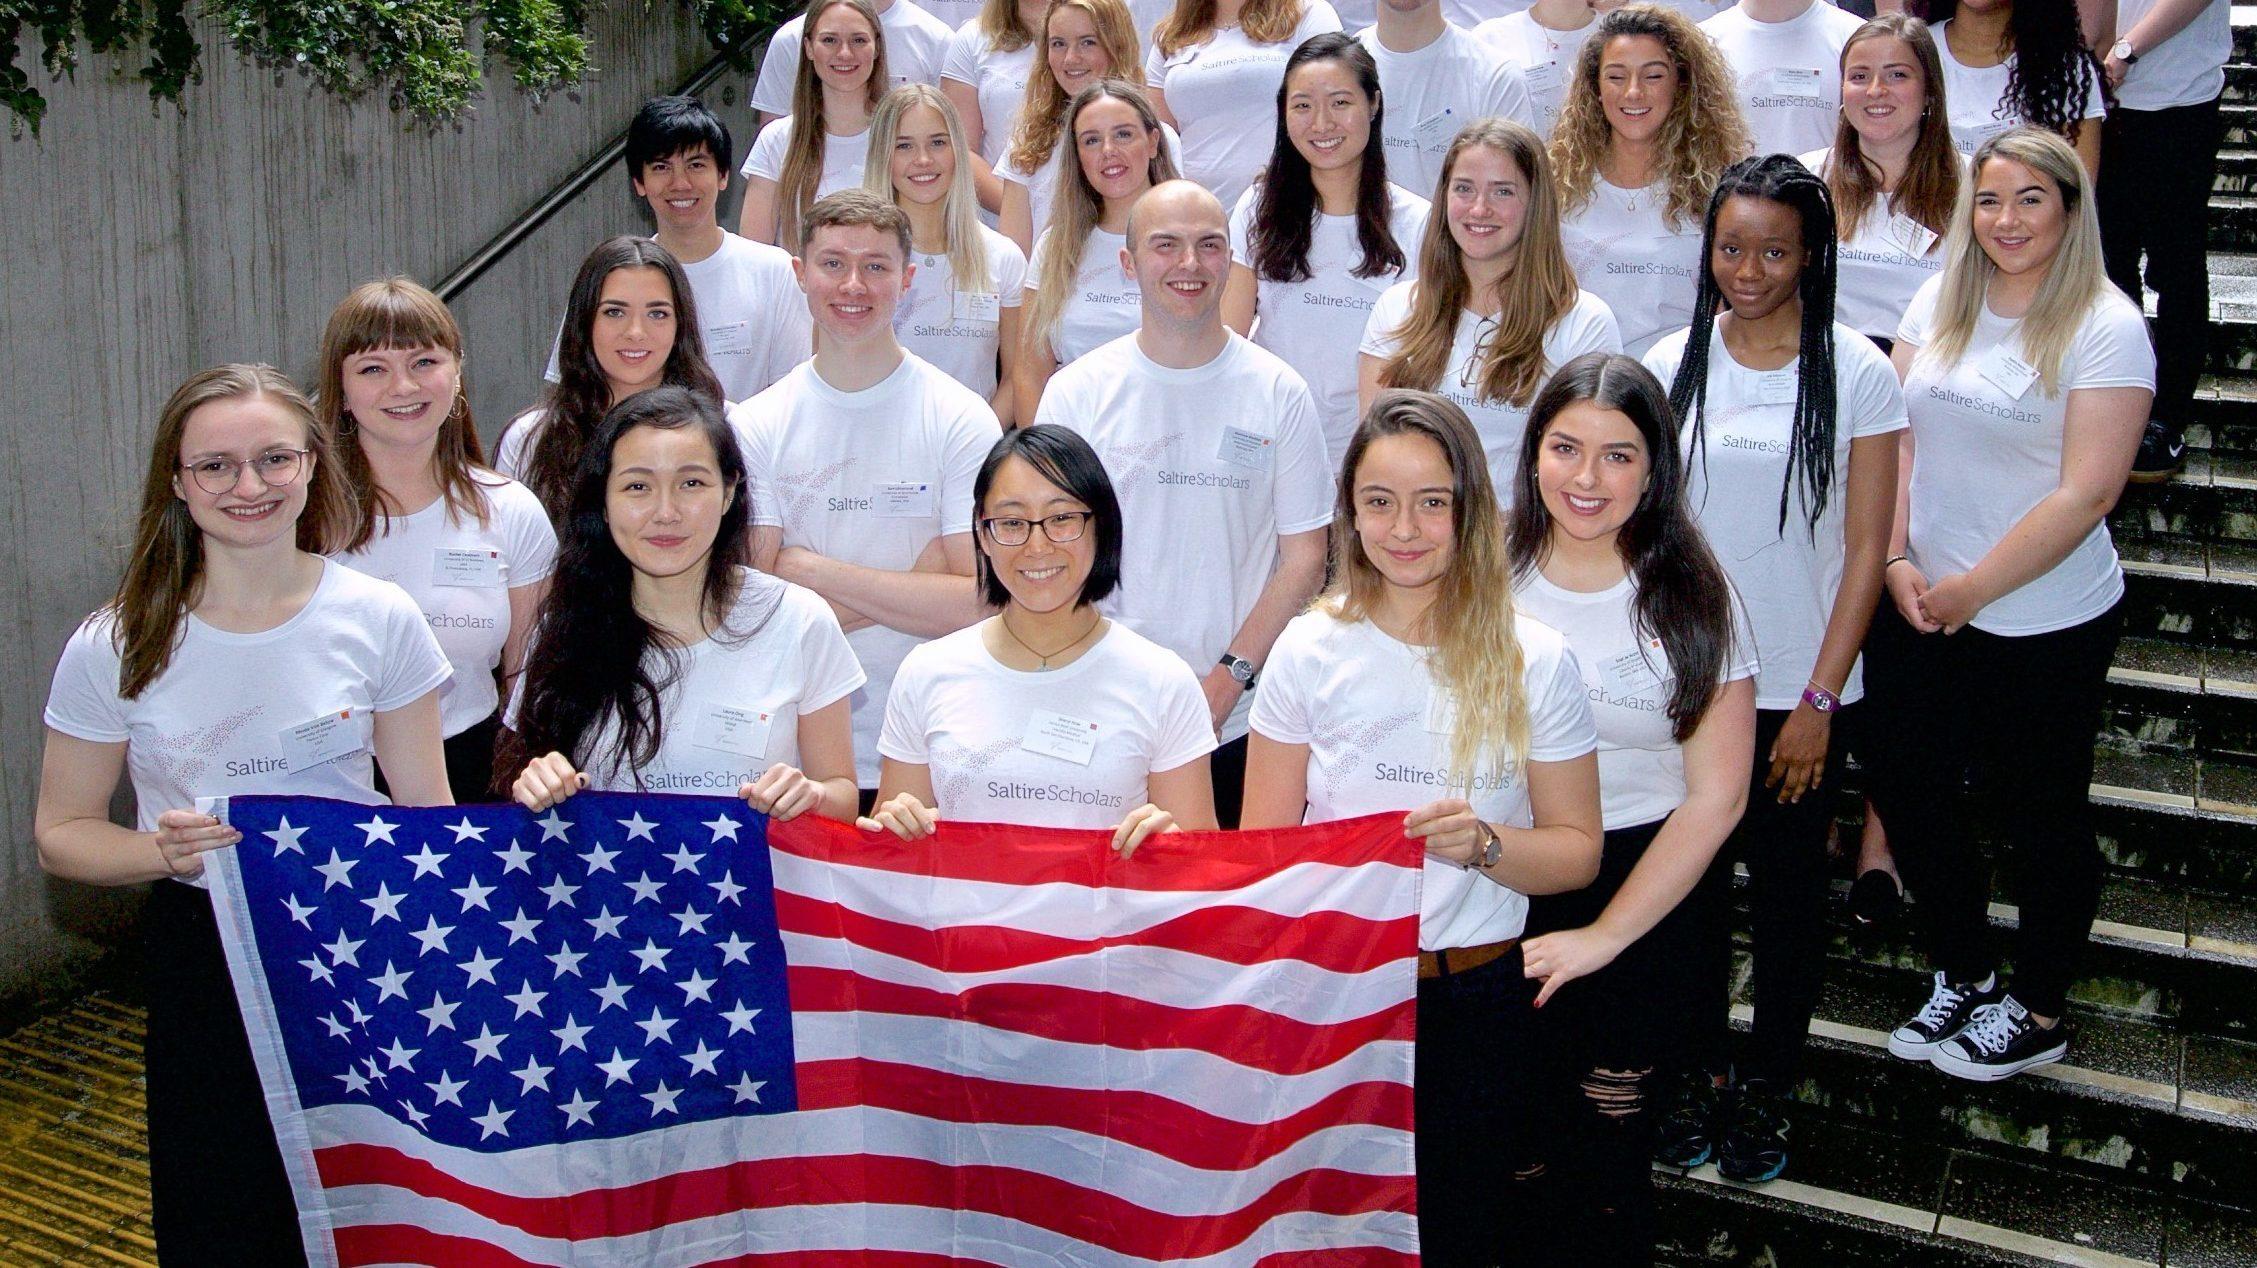 USA-cropped-photo-1.jpg